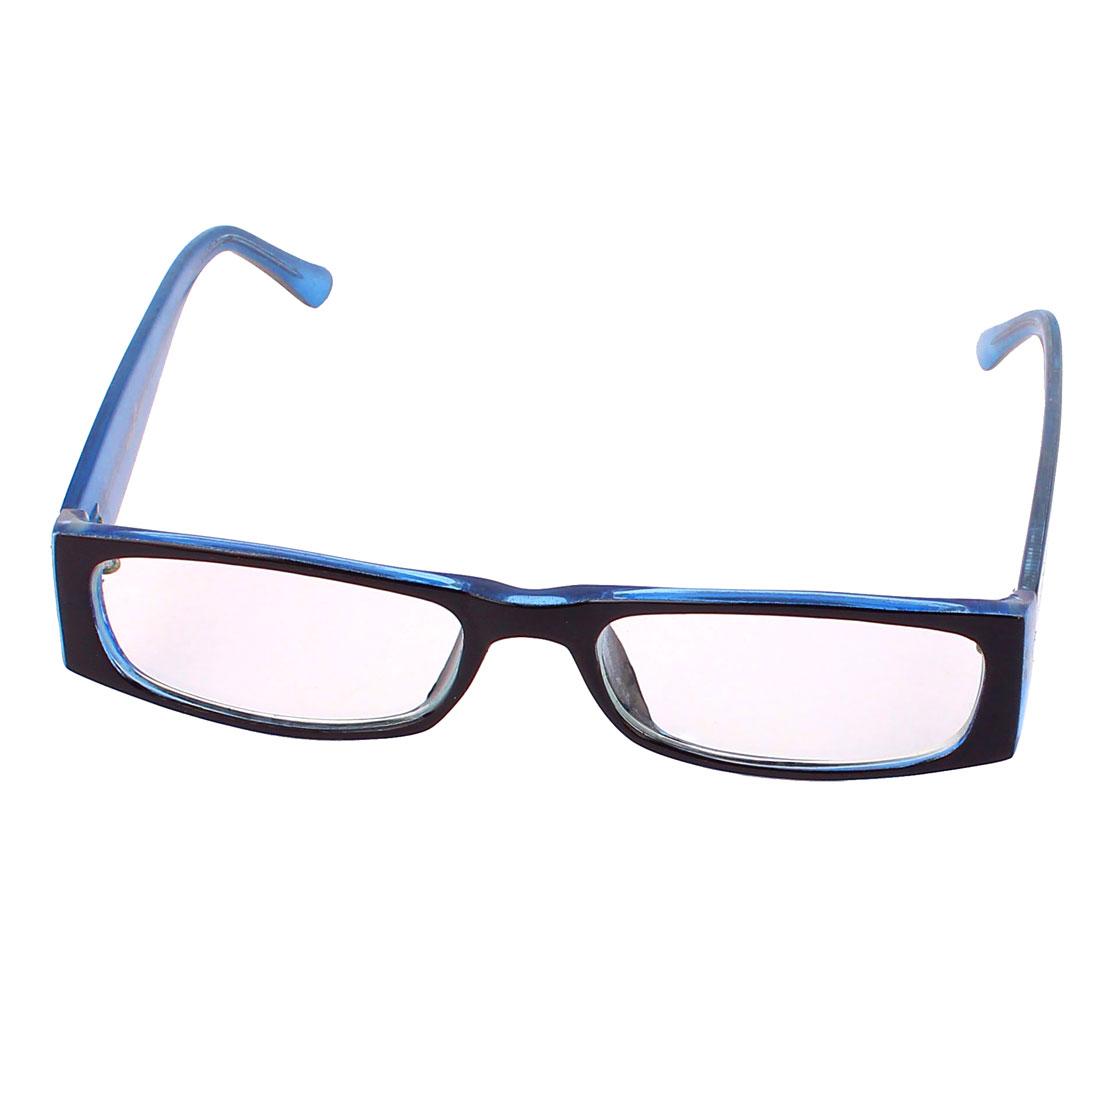 Plastic Single Bridge Clear Lens Plain Spectacles Glasses Eyewear Black Blue